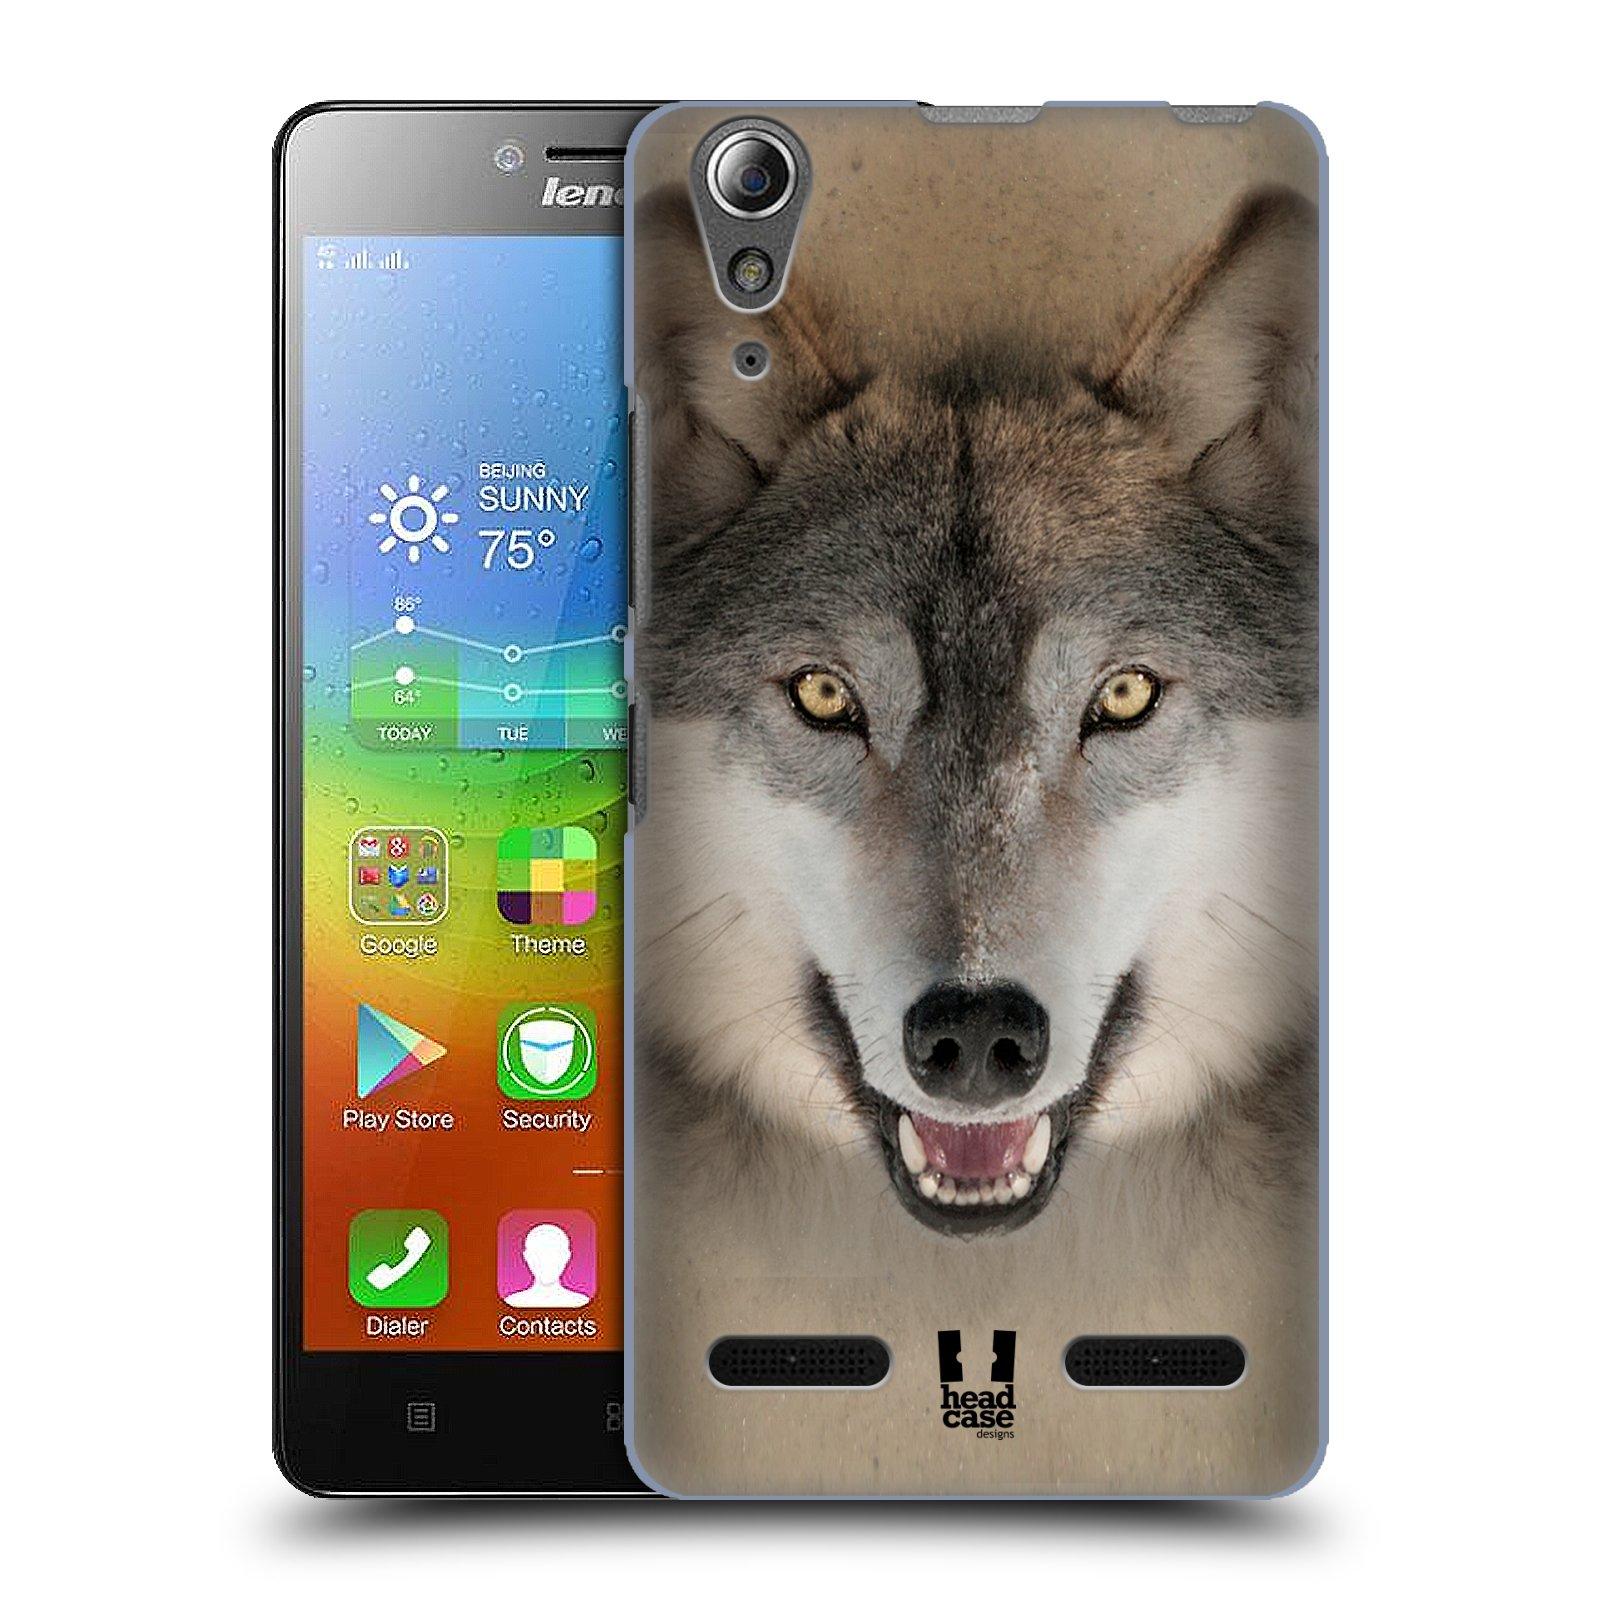 HEAD CASE pevný plastový obal na mobil LENOVO A6000 / A6000 PLUS vzor Zvířecí tváře 2 vlk šedý